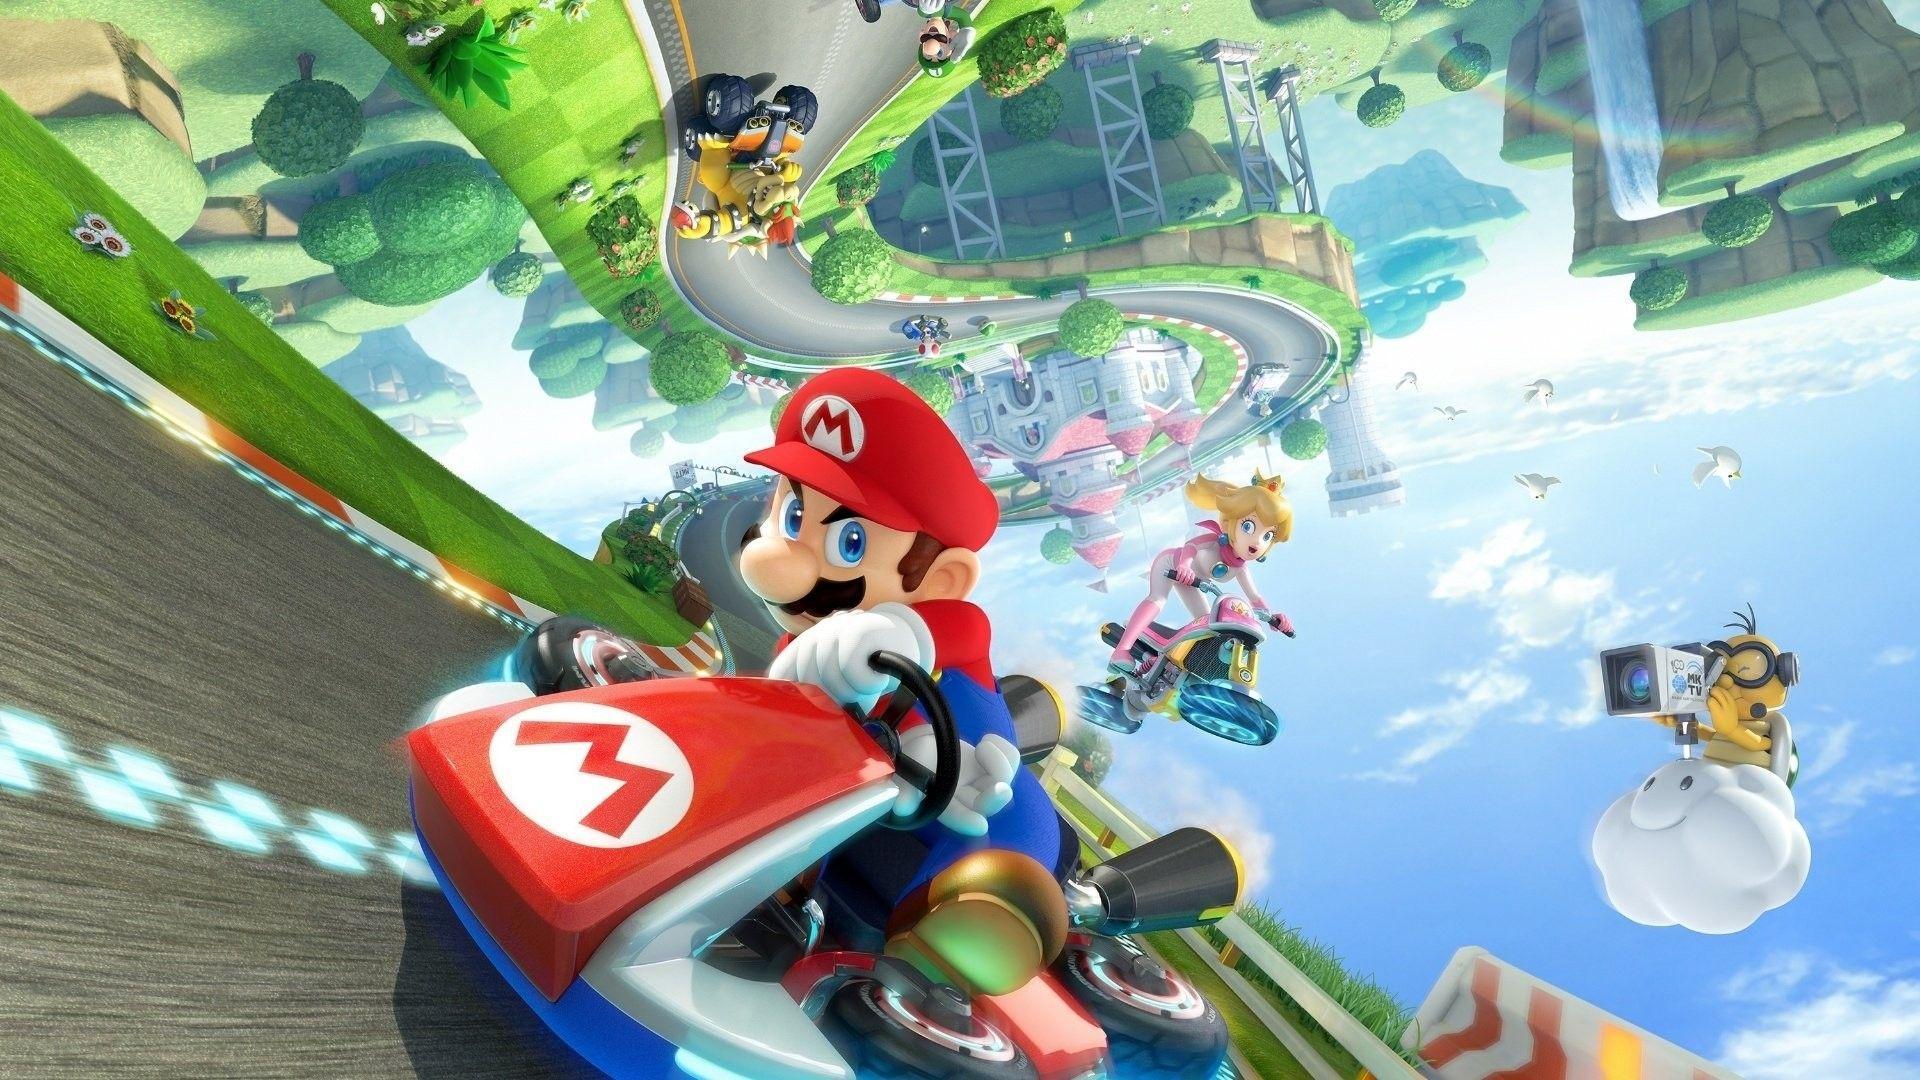 Mario Kart Wallpapers Top Free Mario Kart Backgrounds Wallpaperaccess